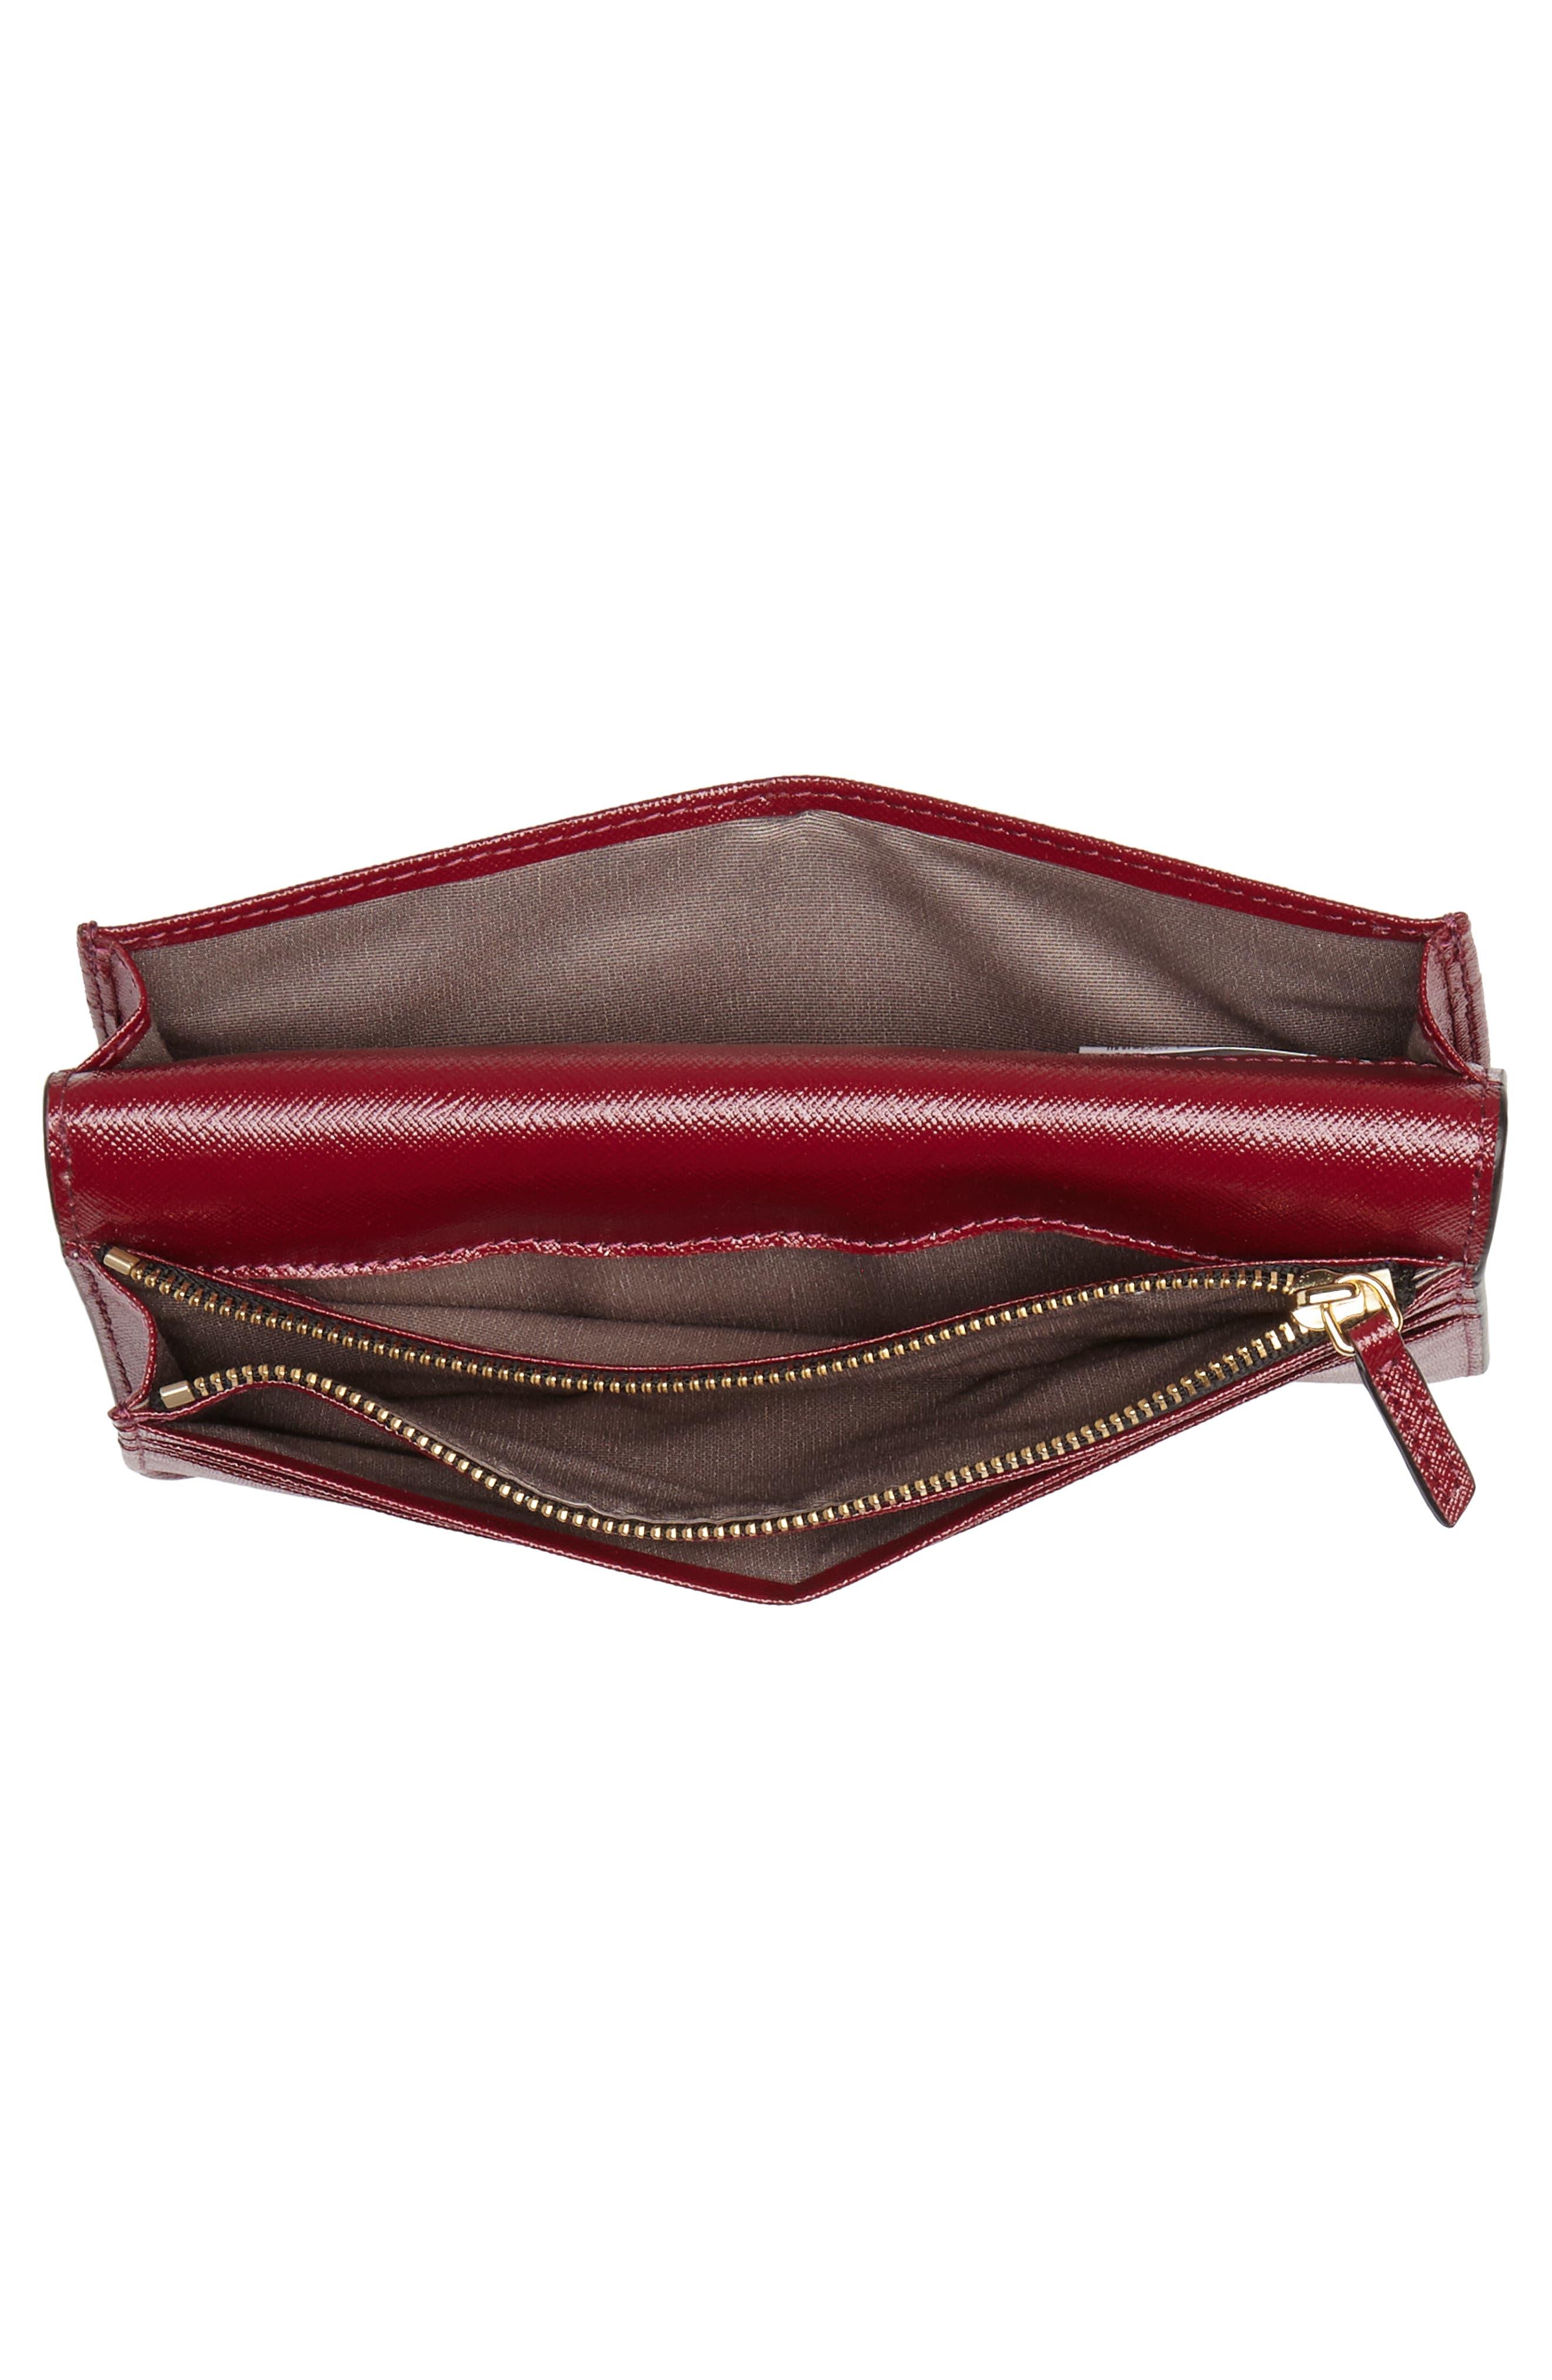 Snapshot Open Face Leather Wallet,                             Alternate thumbnail 2, color,                             Light Slate Multi